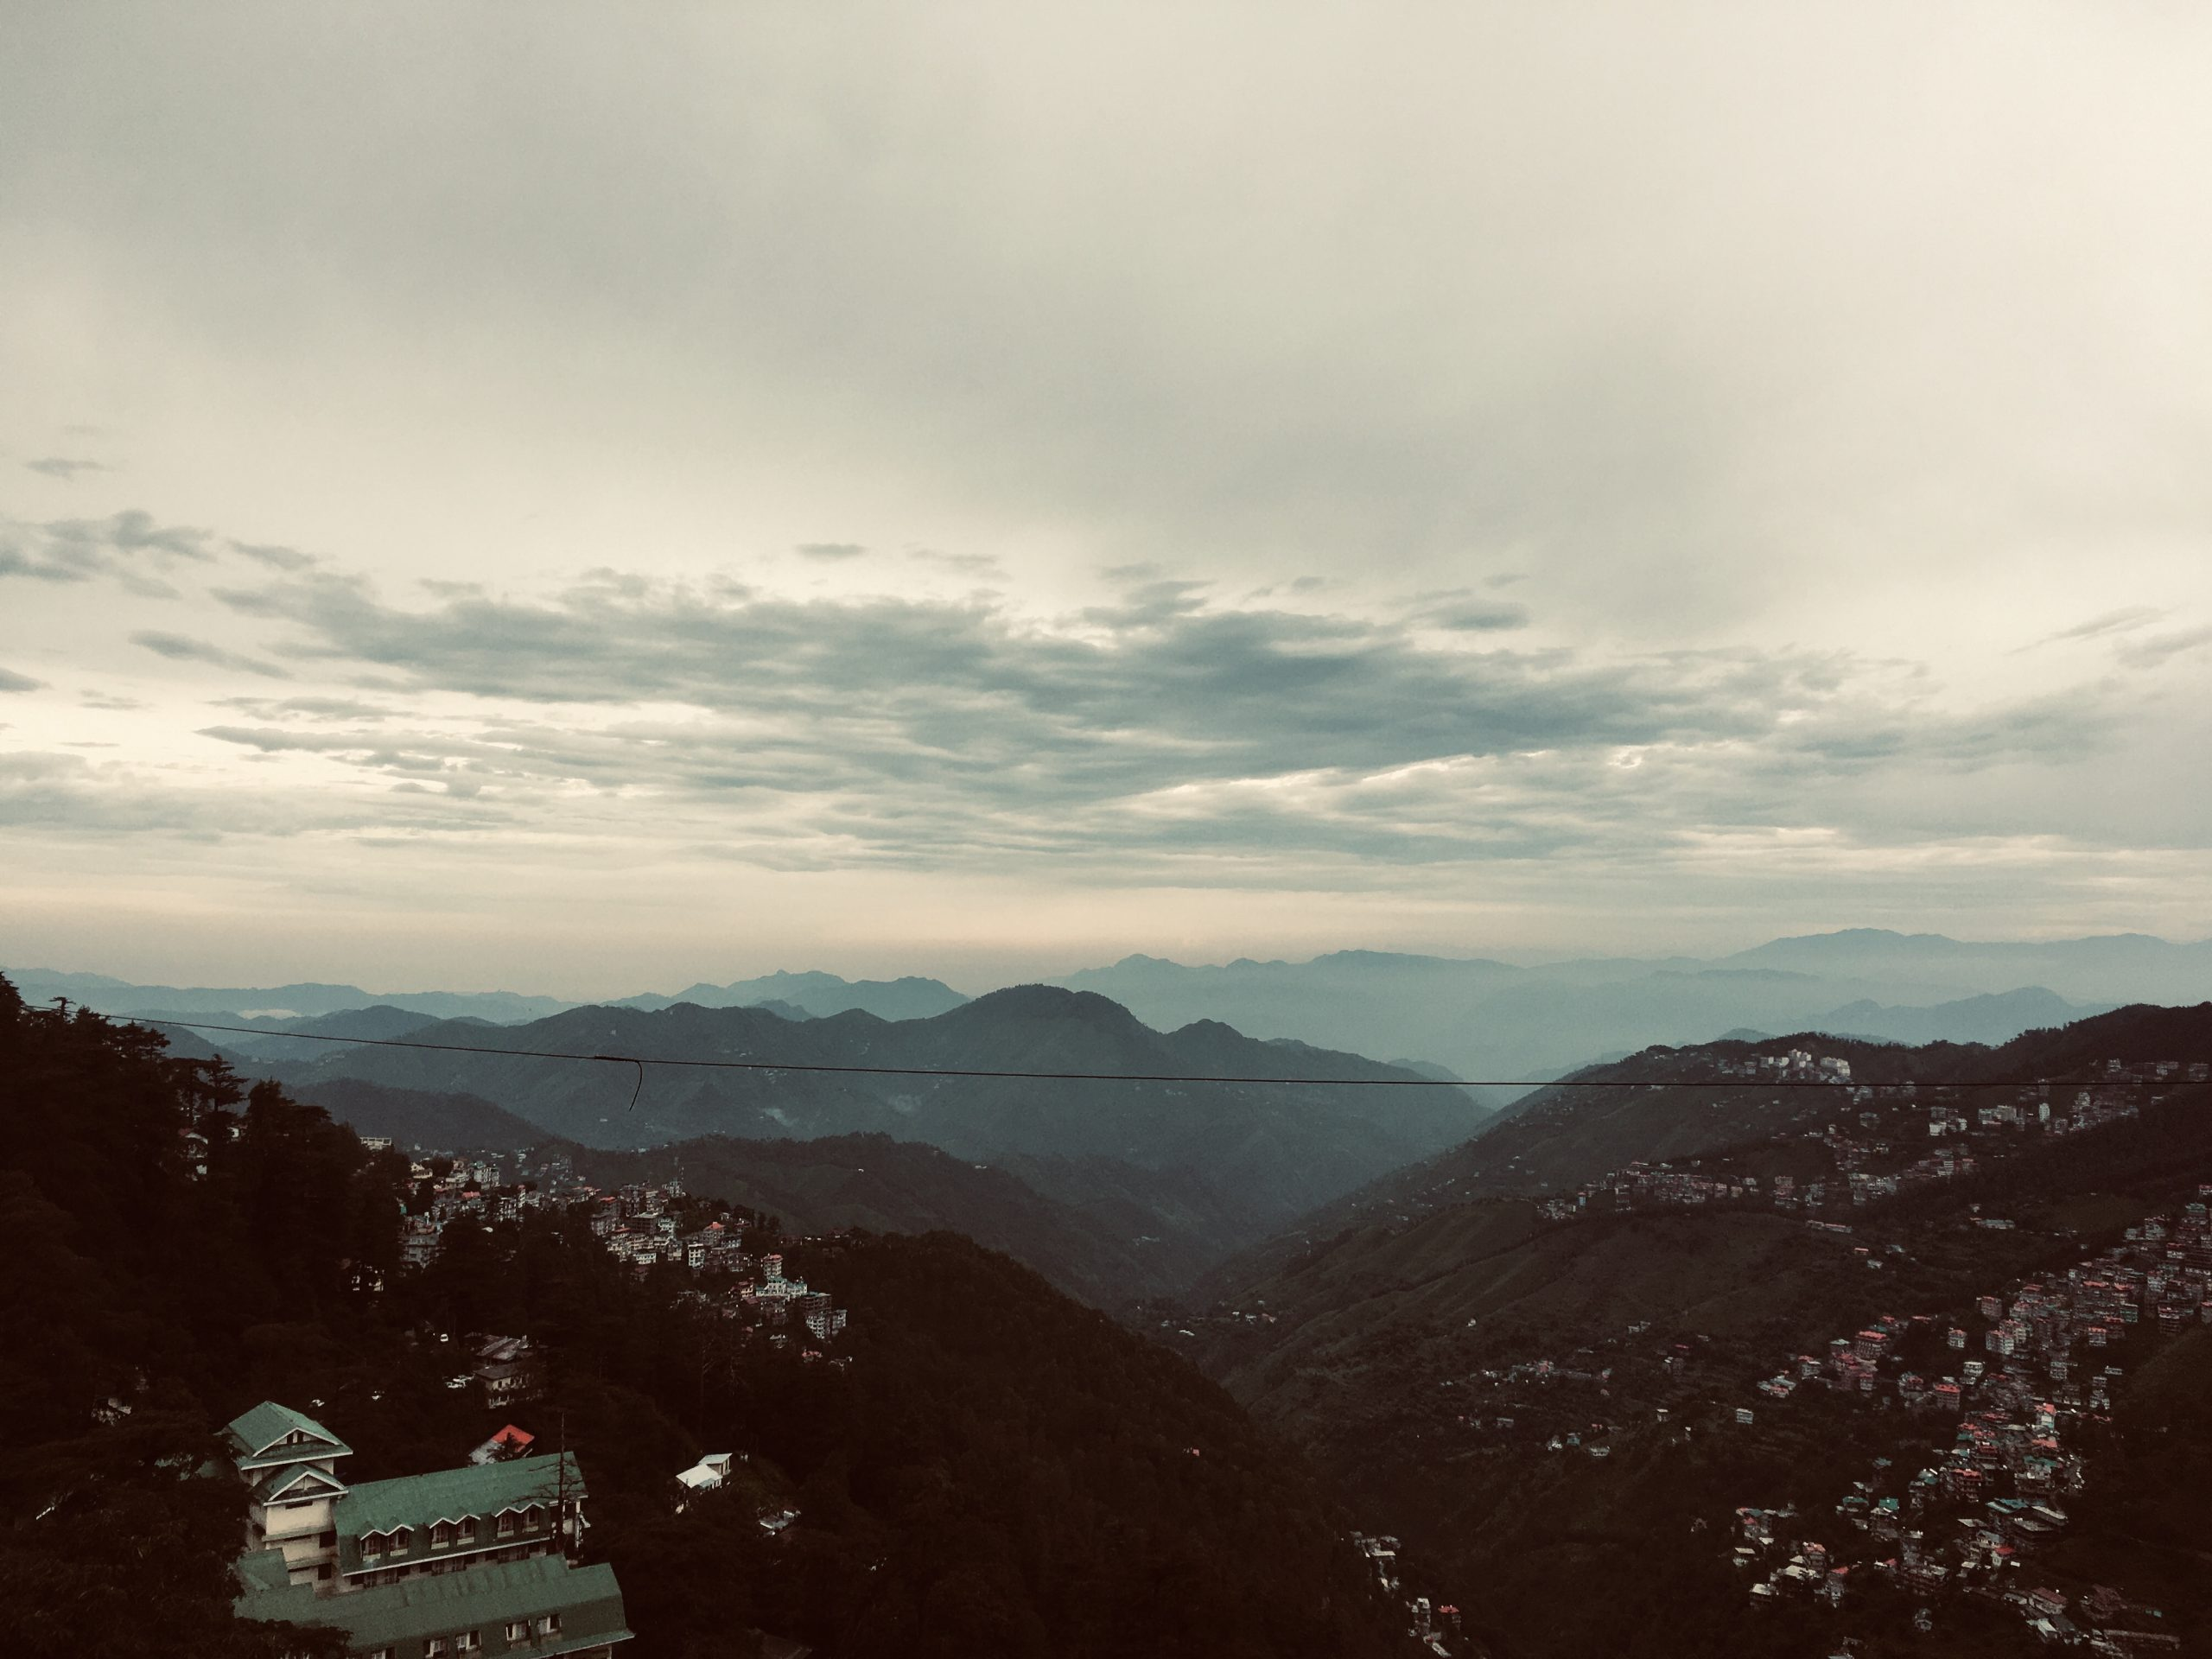 Panoramic cityscape of Shimla